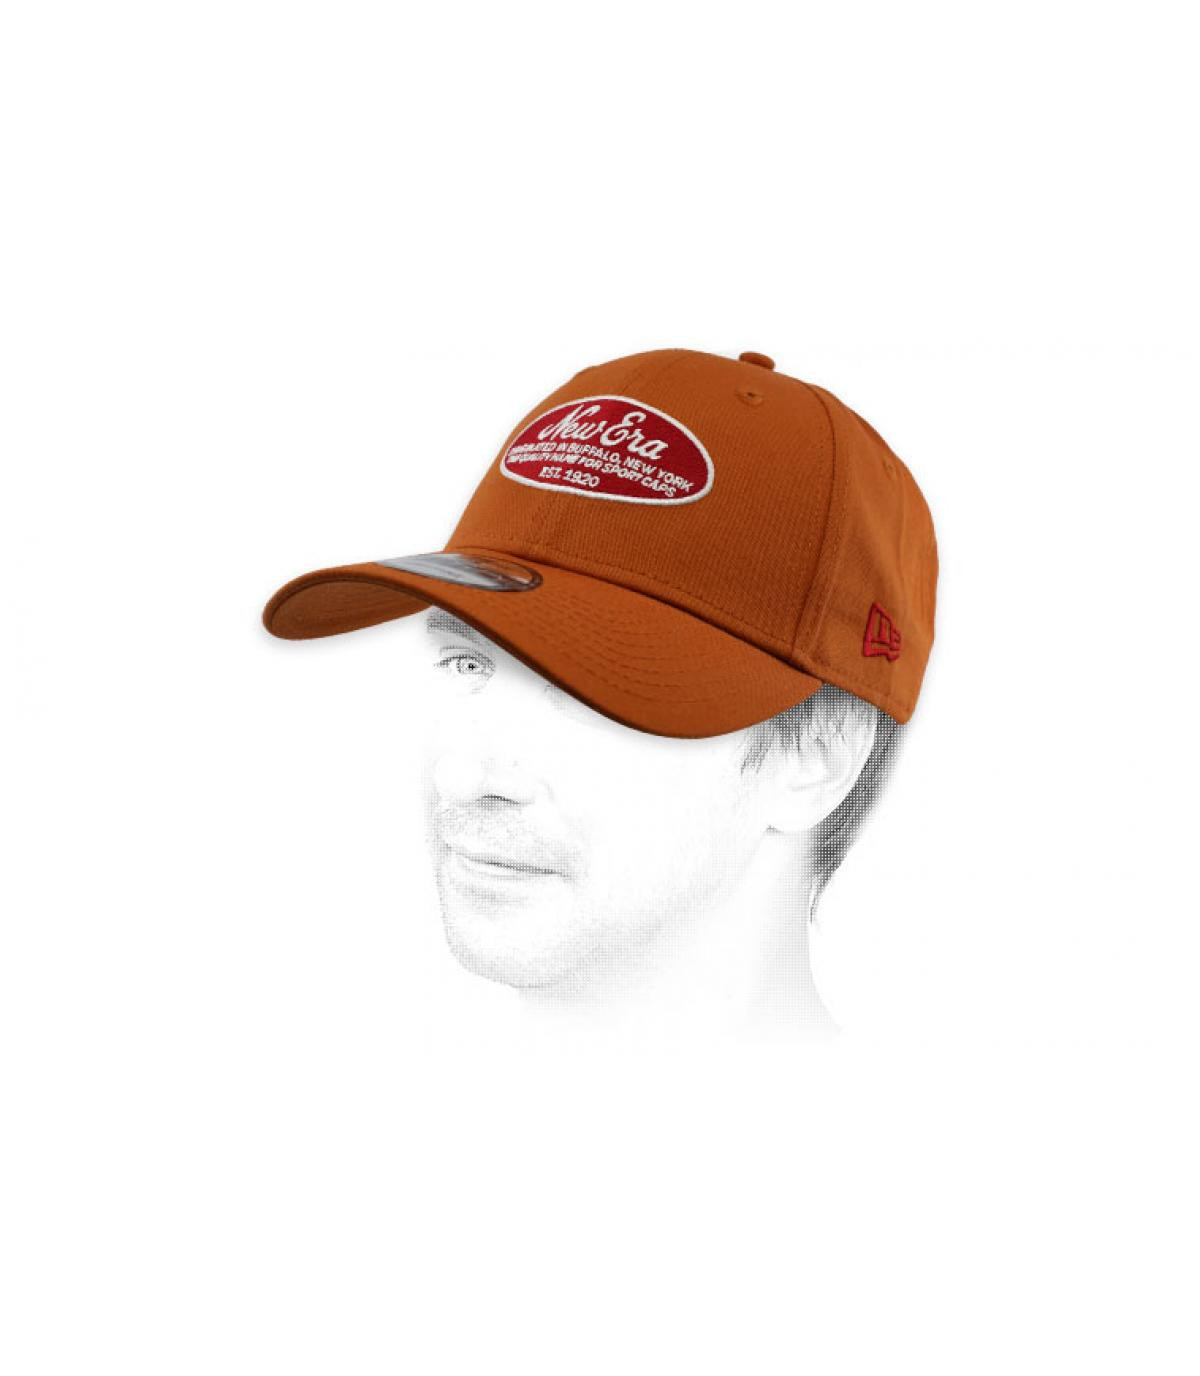 brown New Era cap patch